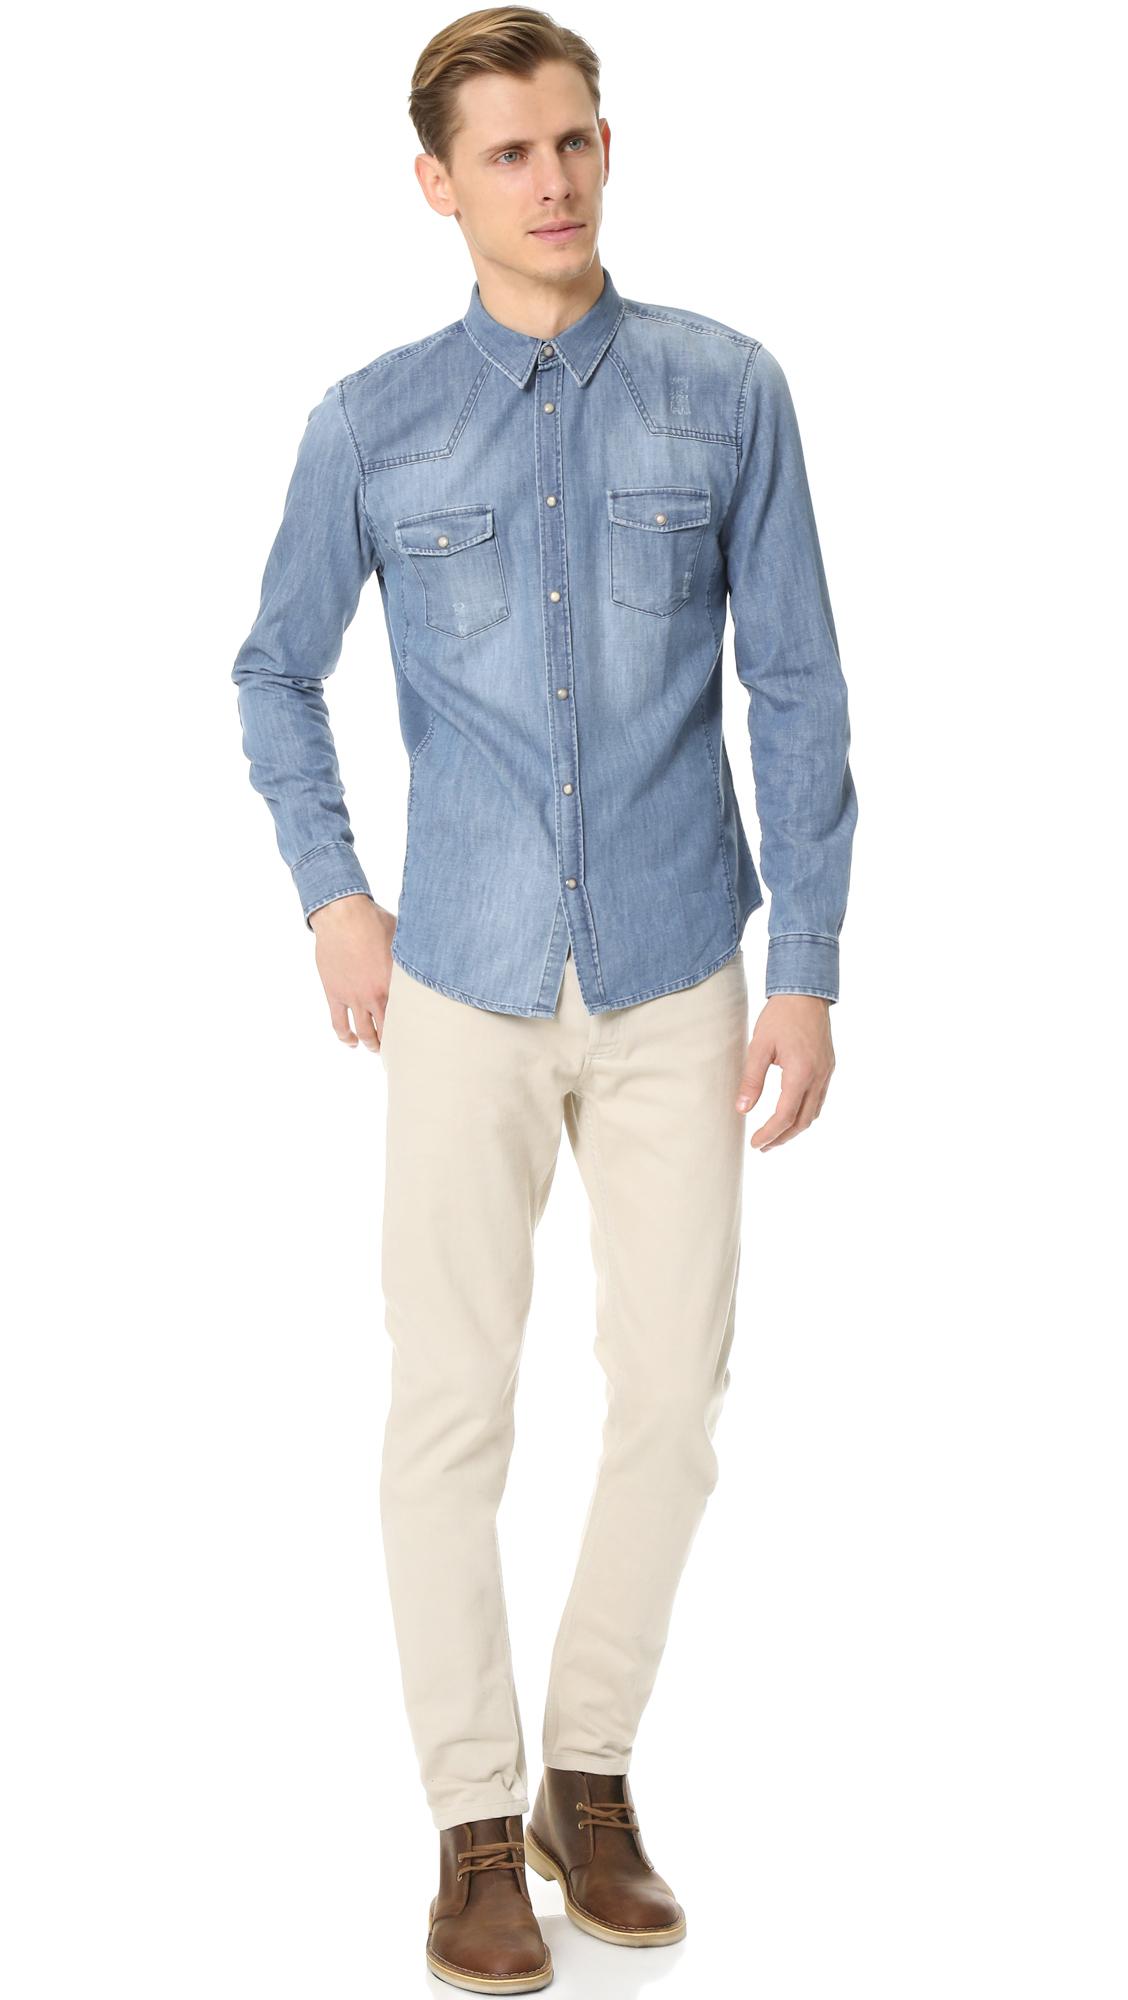 42c348fd5b8 The Kooples Sport Distressed Denim Shirt in Blue for Men - Lyst